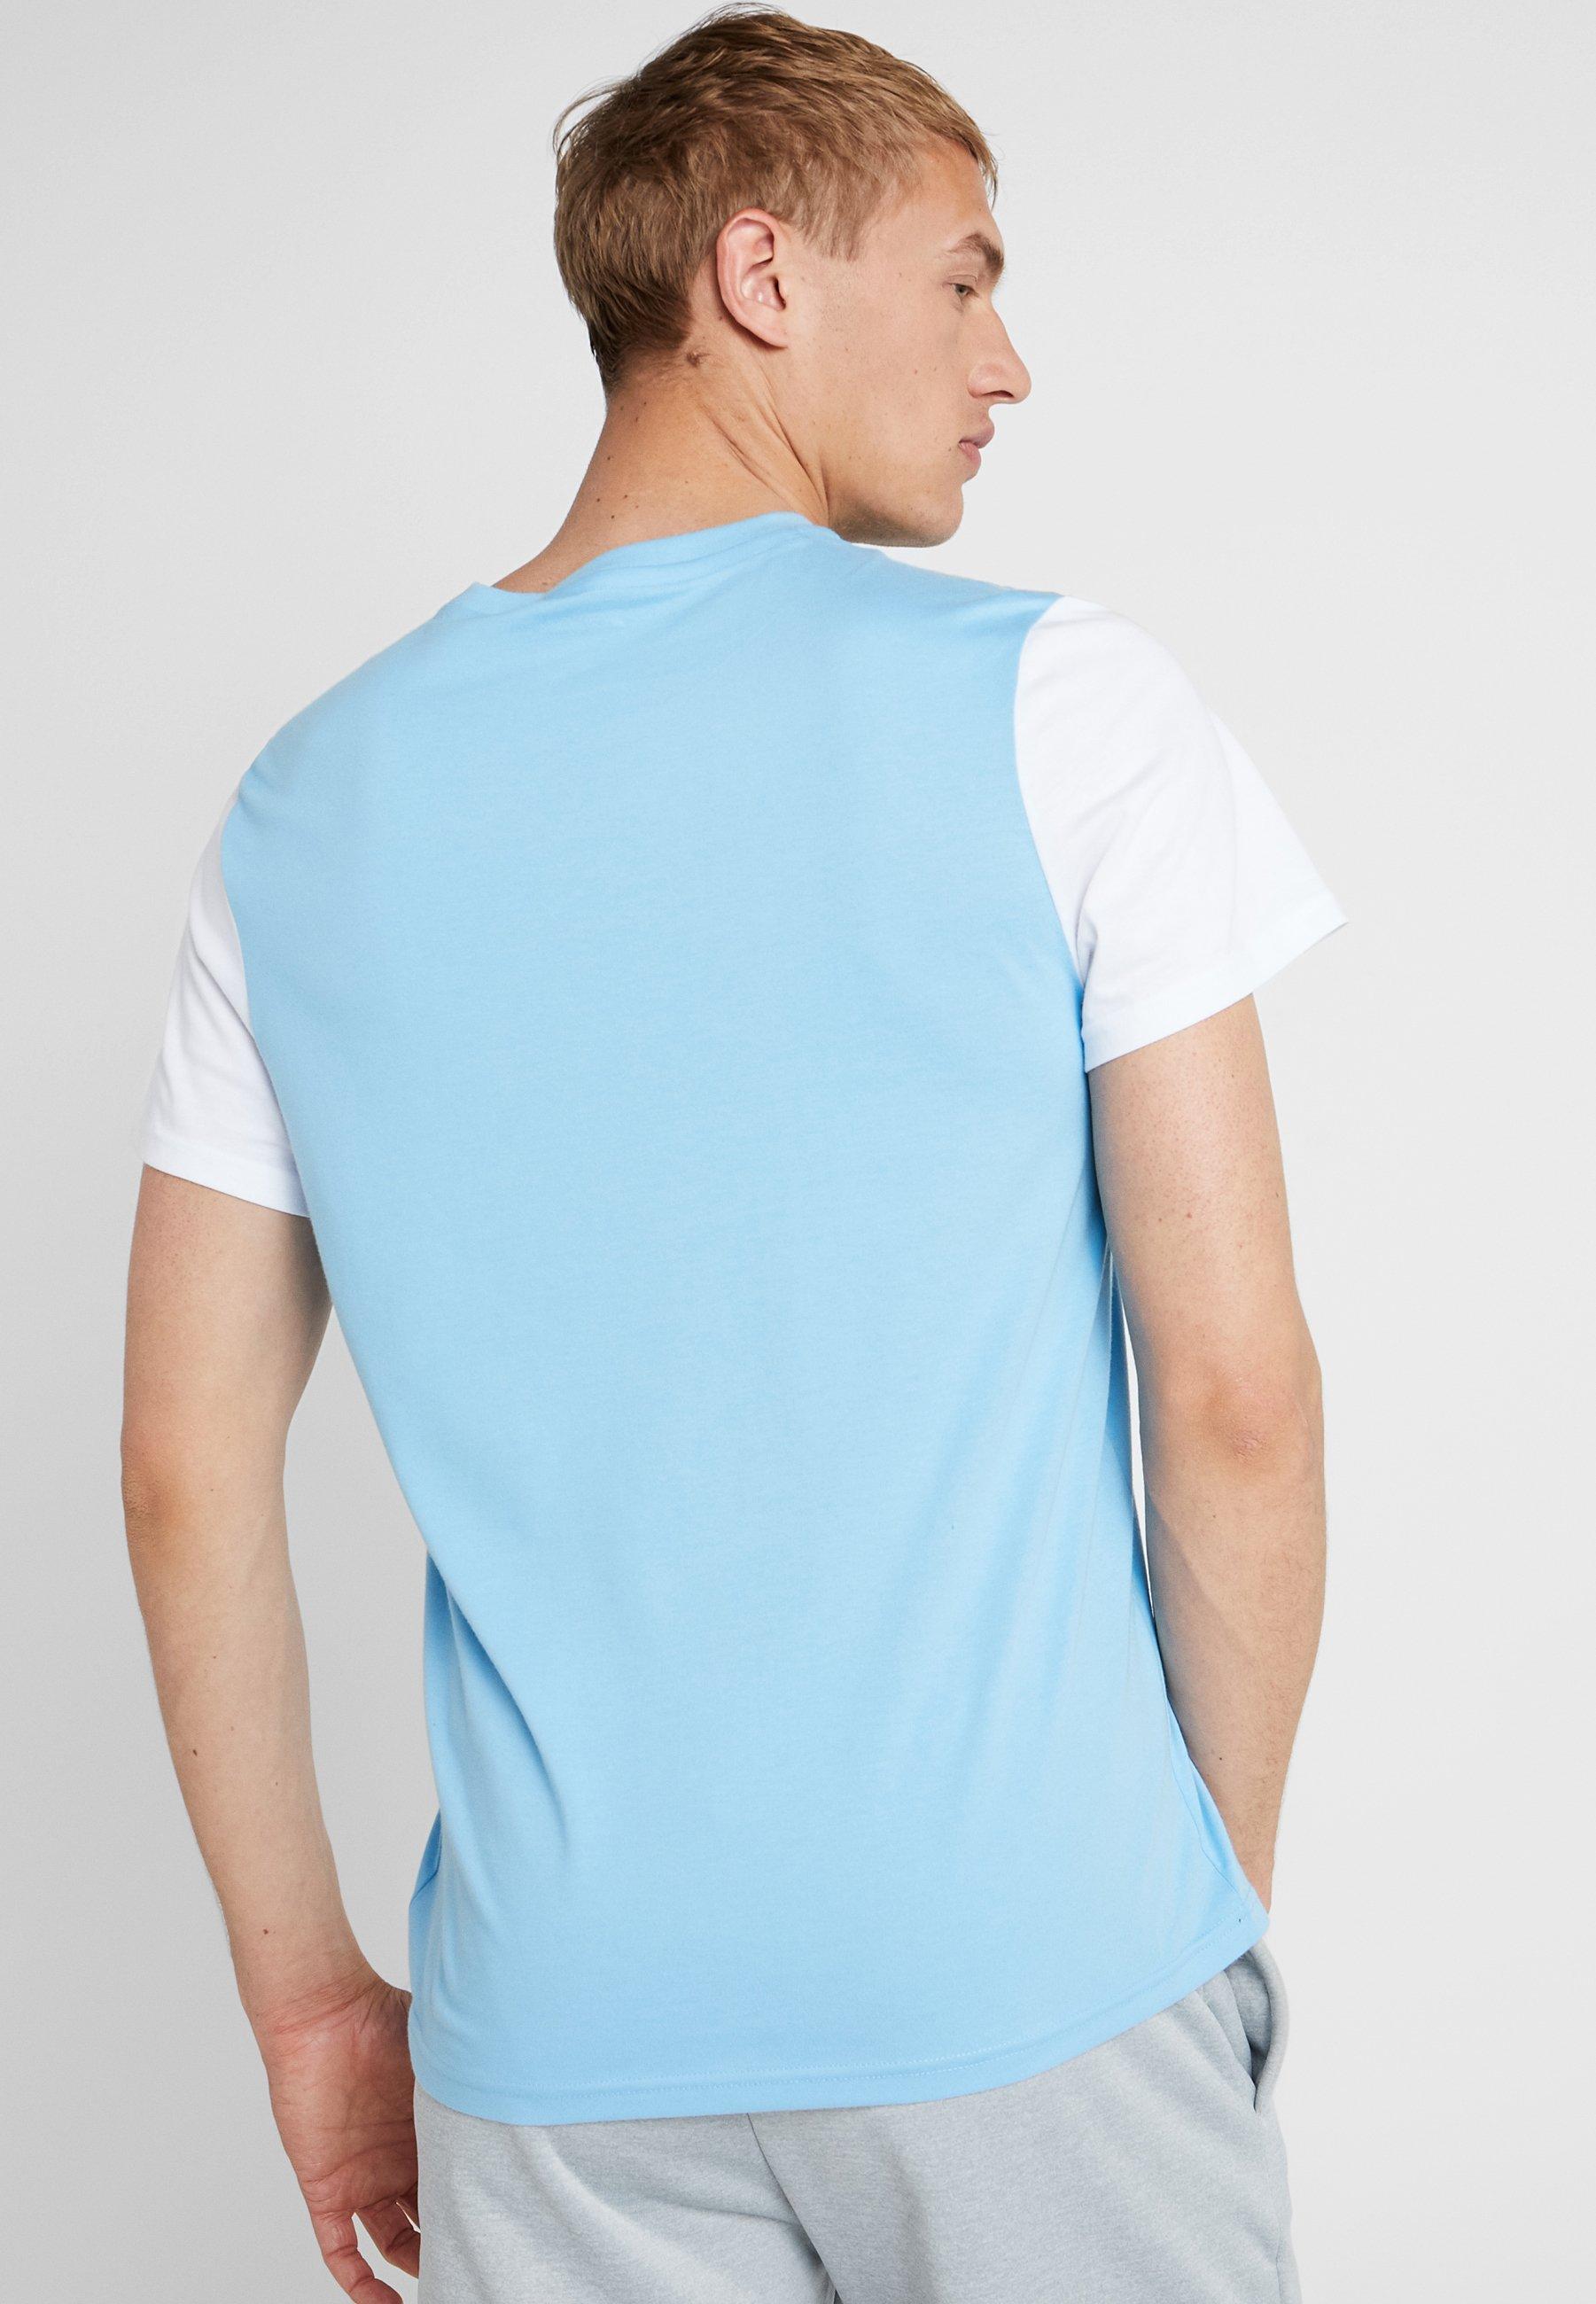 Alaskan Imprimé Blue Sport Core Tommy Logo shirt Colourblock TeeT MpzSUV